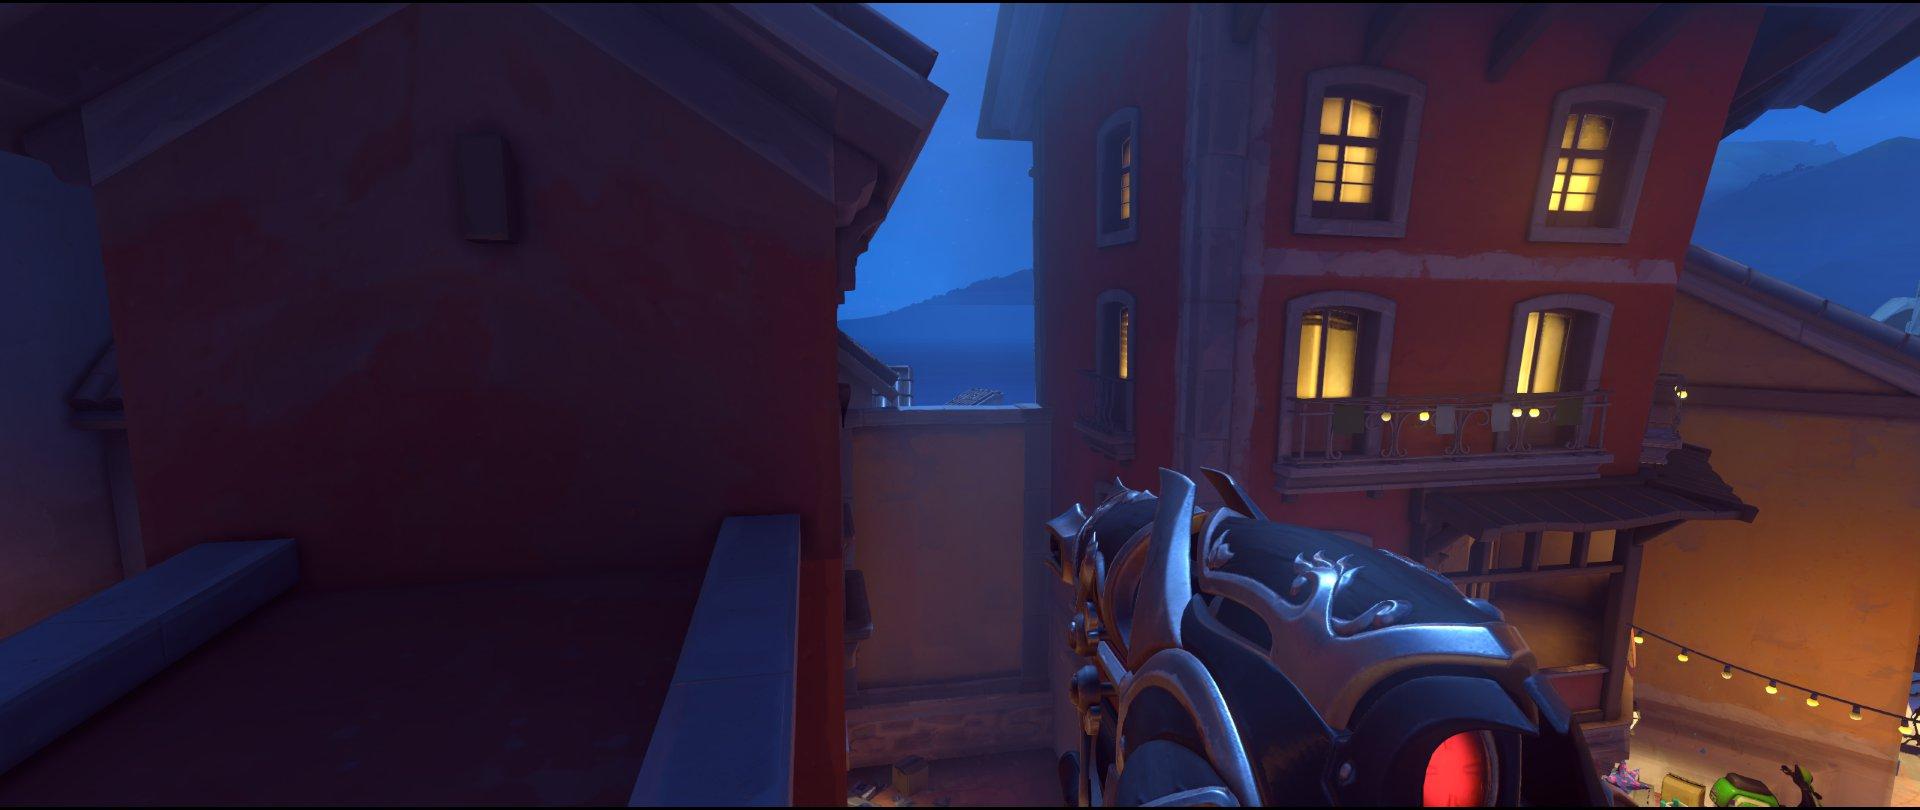 Side wall defense sniping spot Widowmaker Dorado.jpg